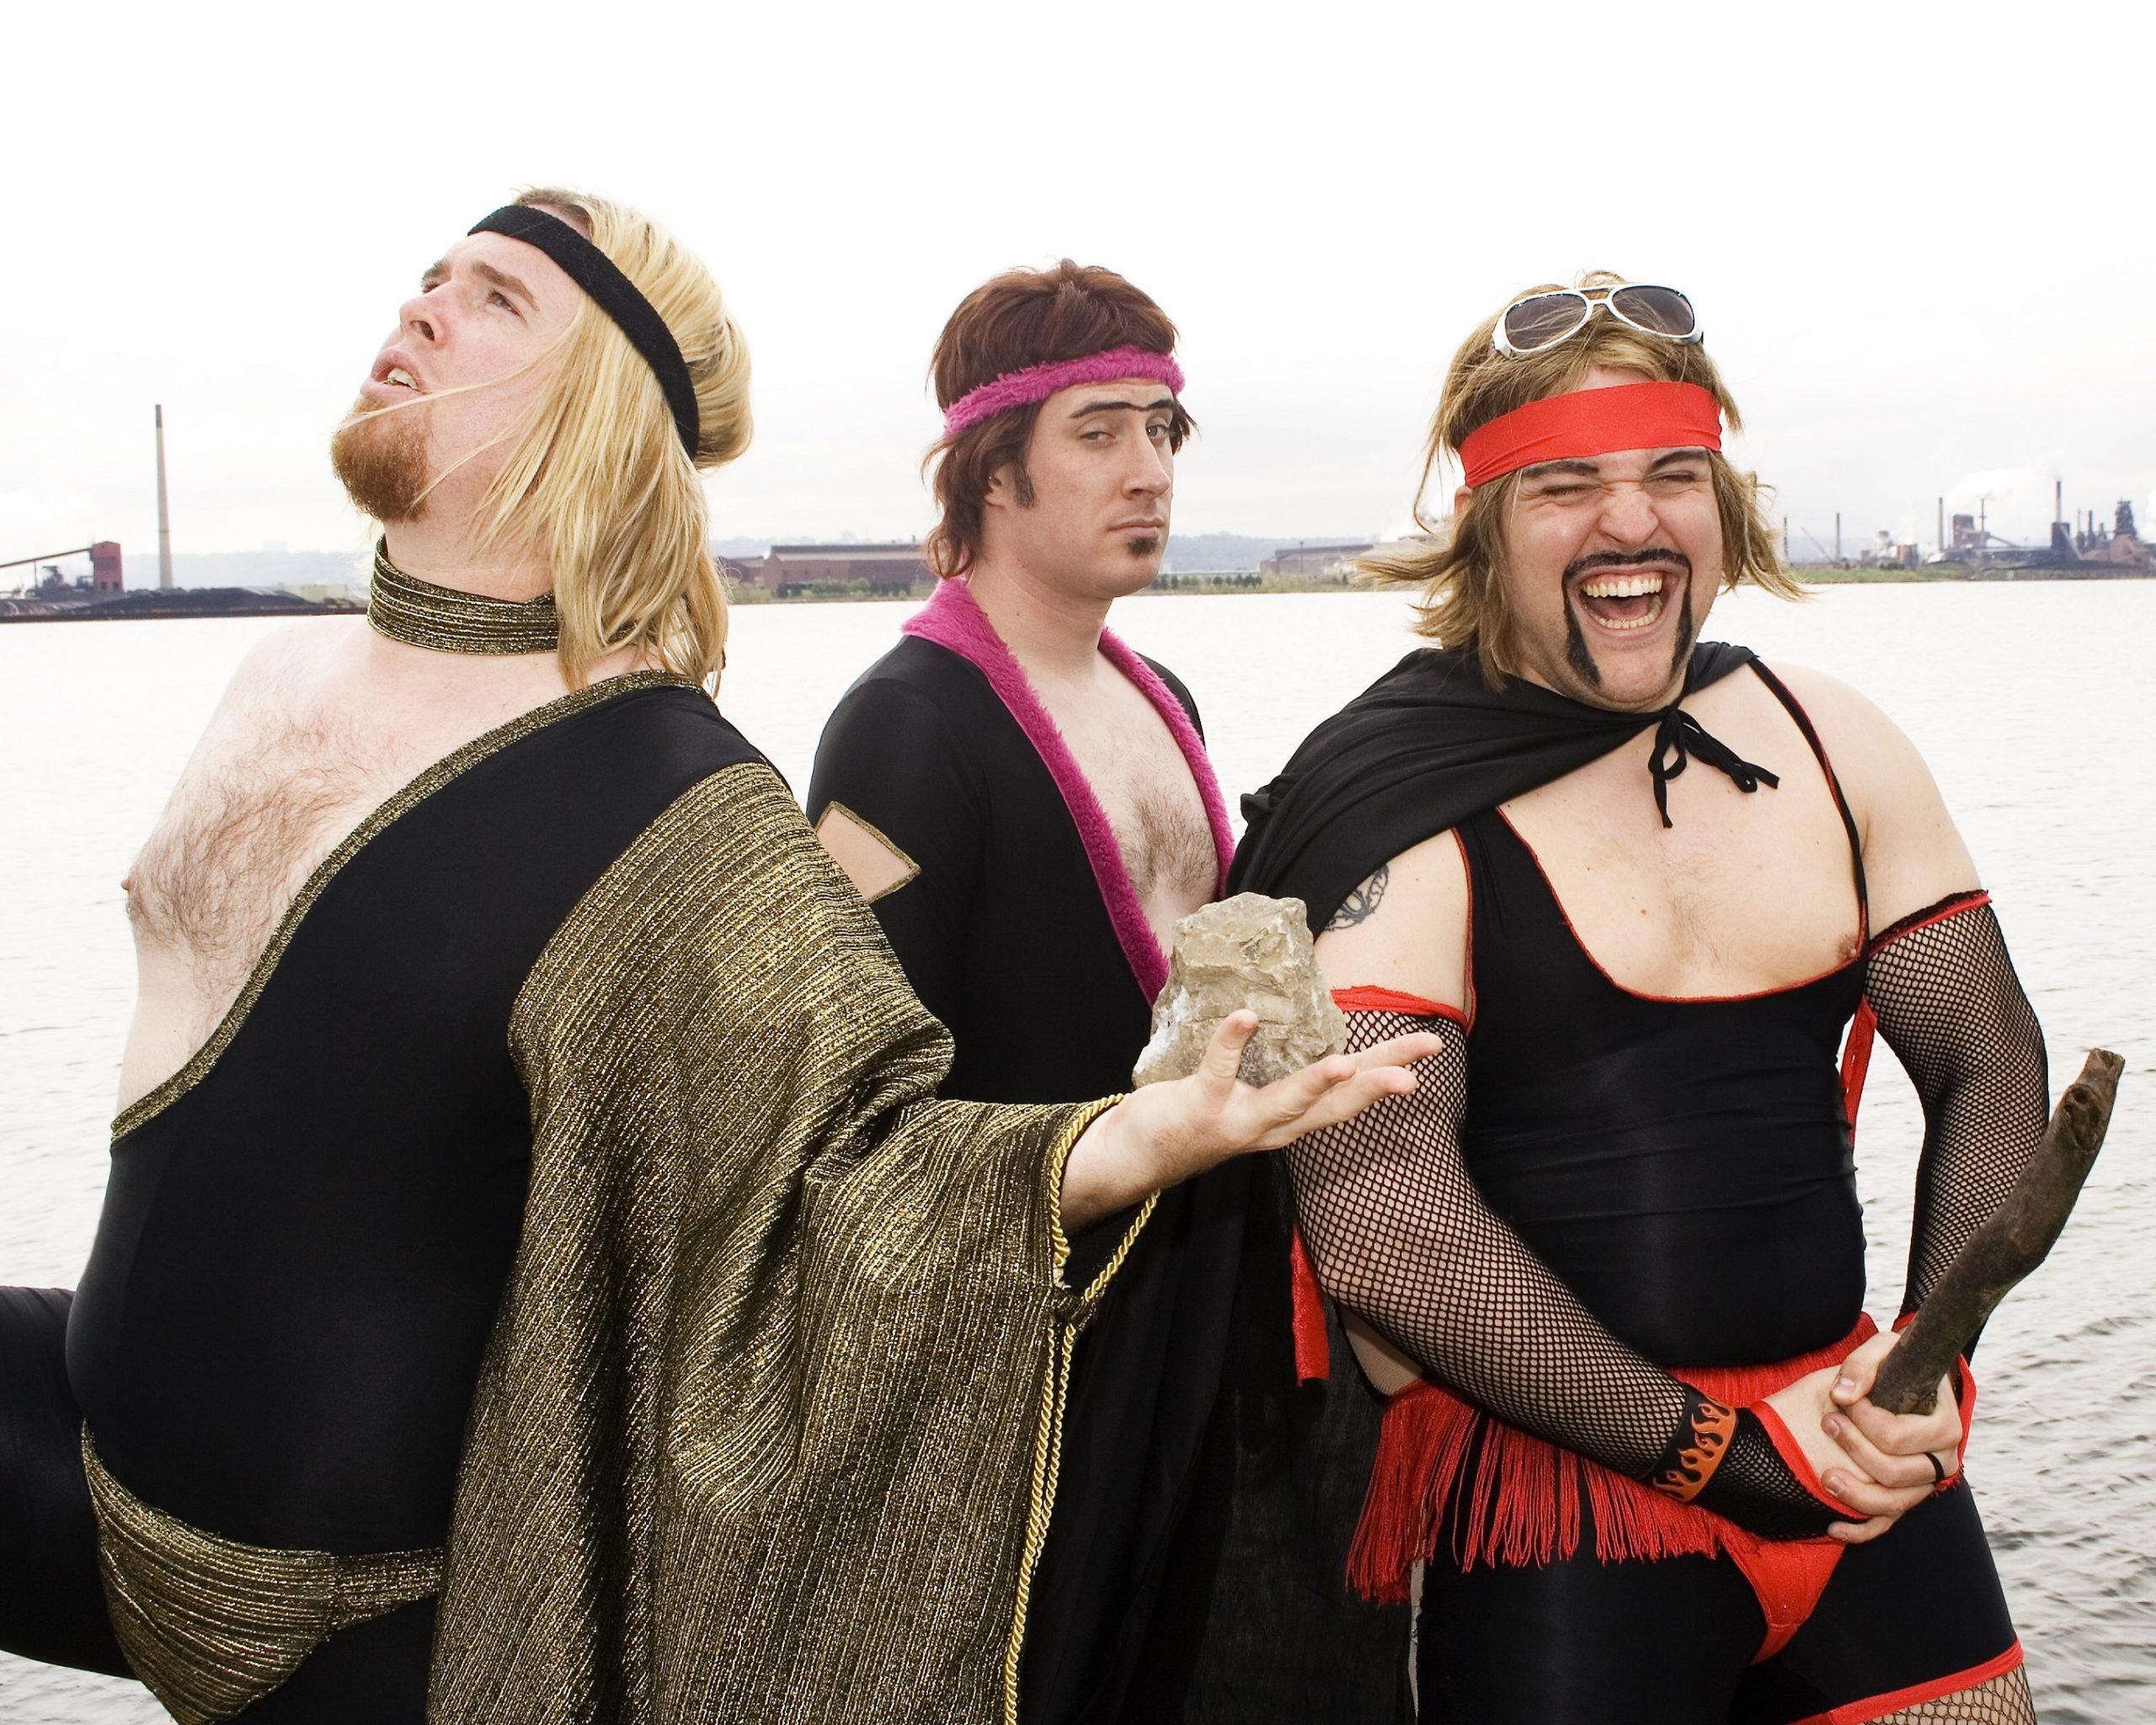 comedic-rock-act-sons-of-butcher-teilen-covid-19-music-video-quaranteen